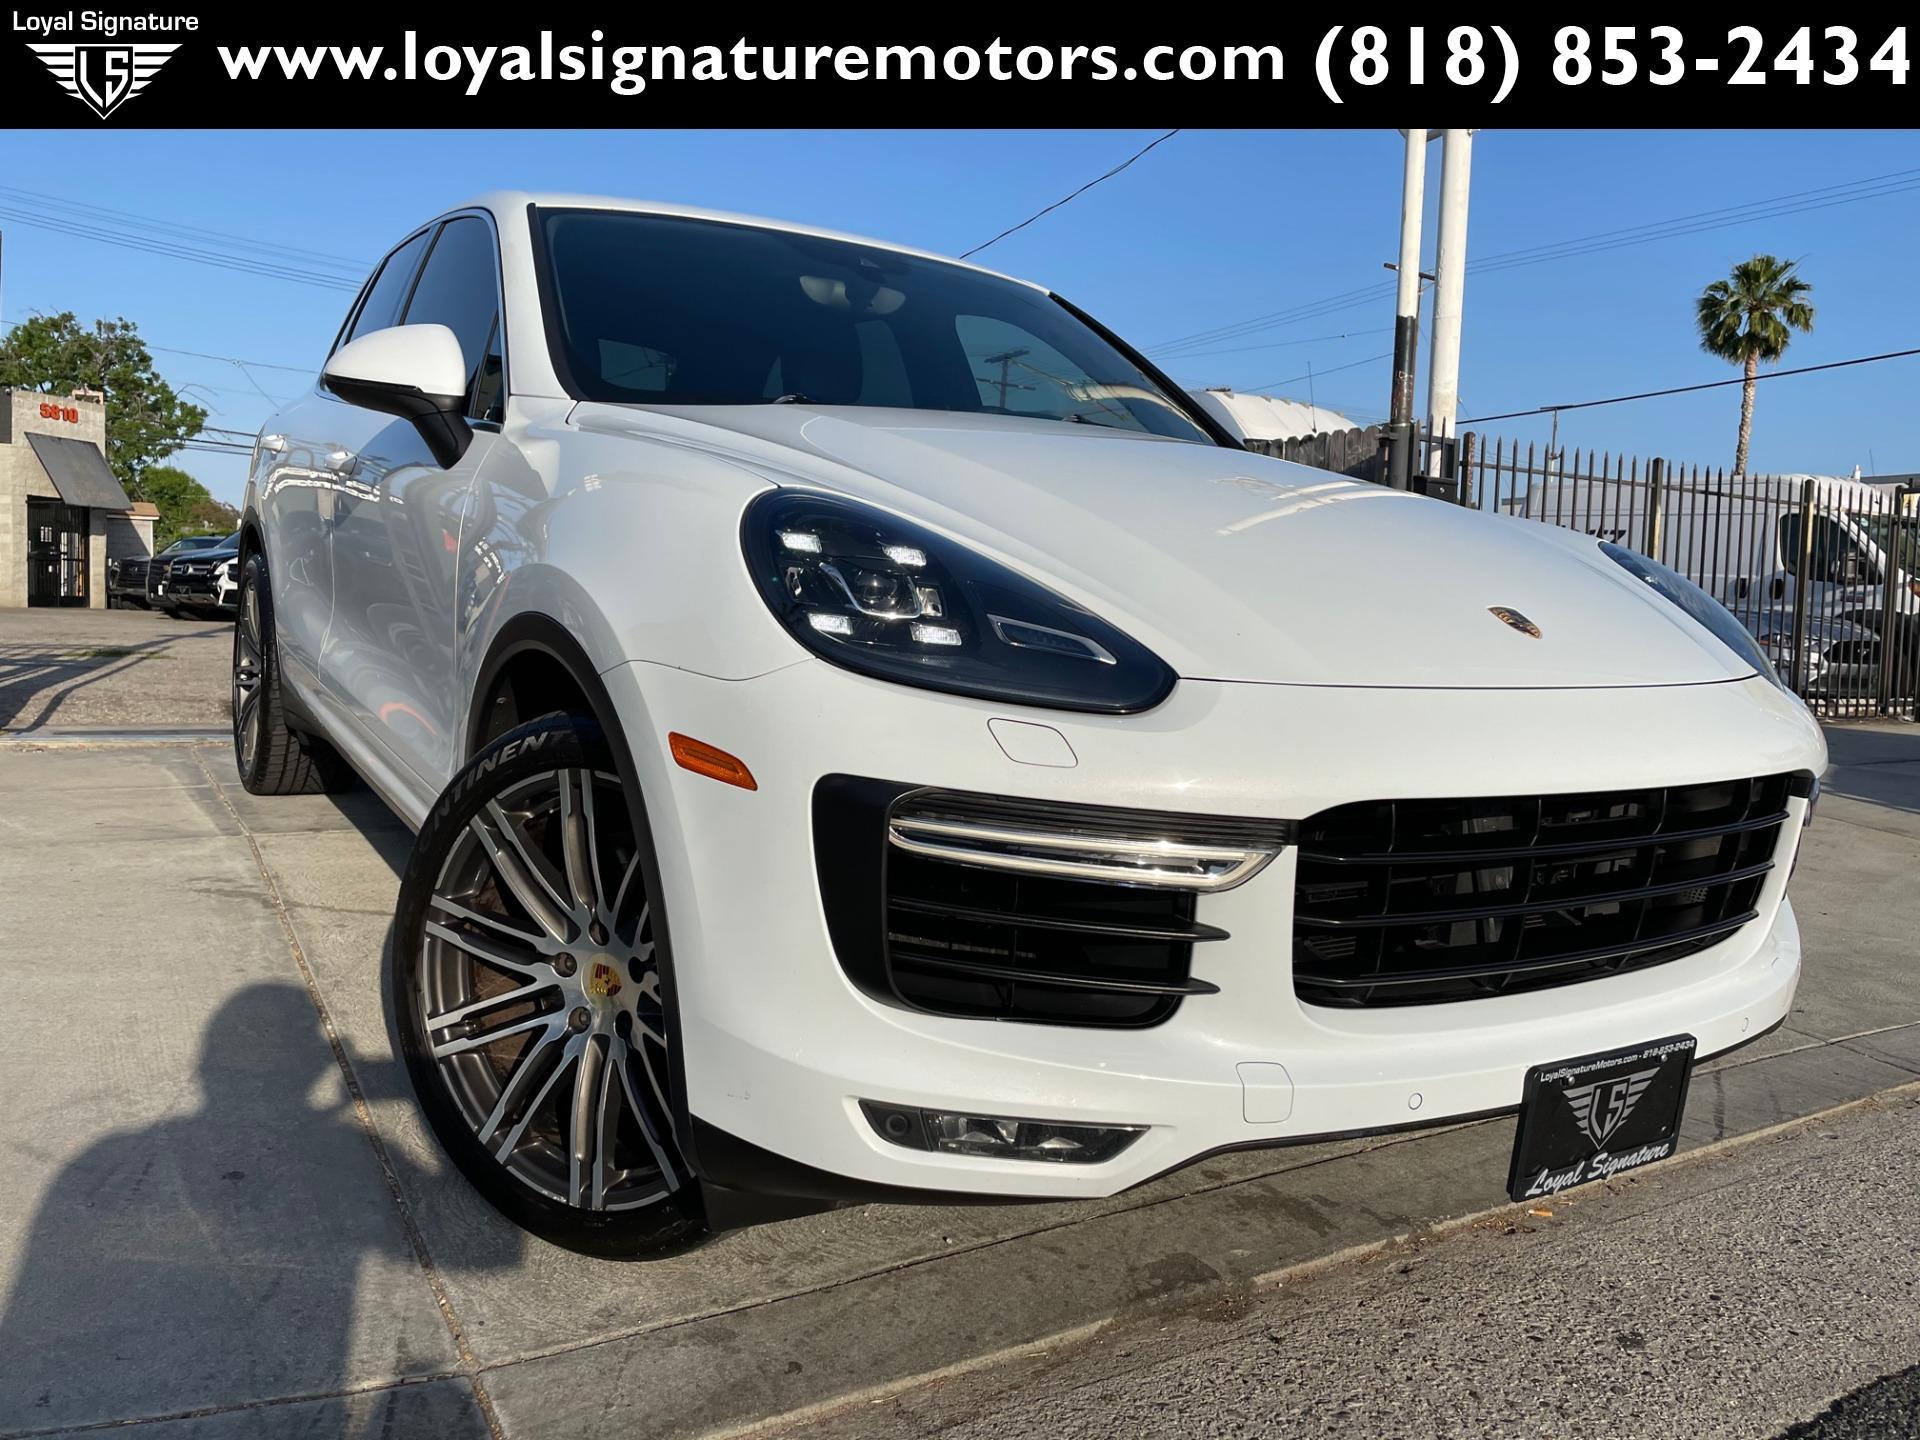 Used 2015 Porsche Cayenne Turbo | Van Nuys, CA